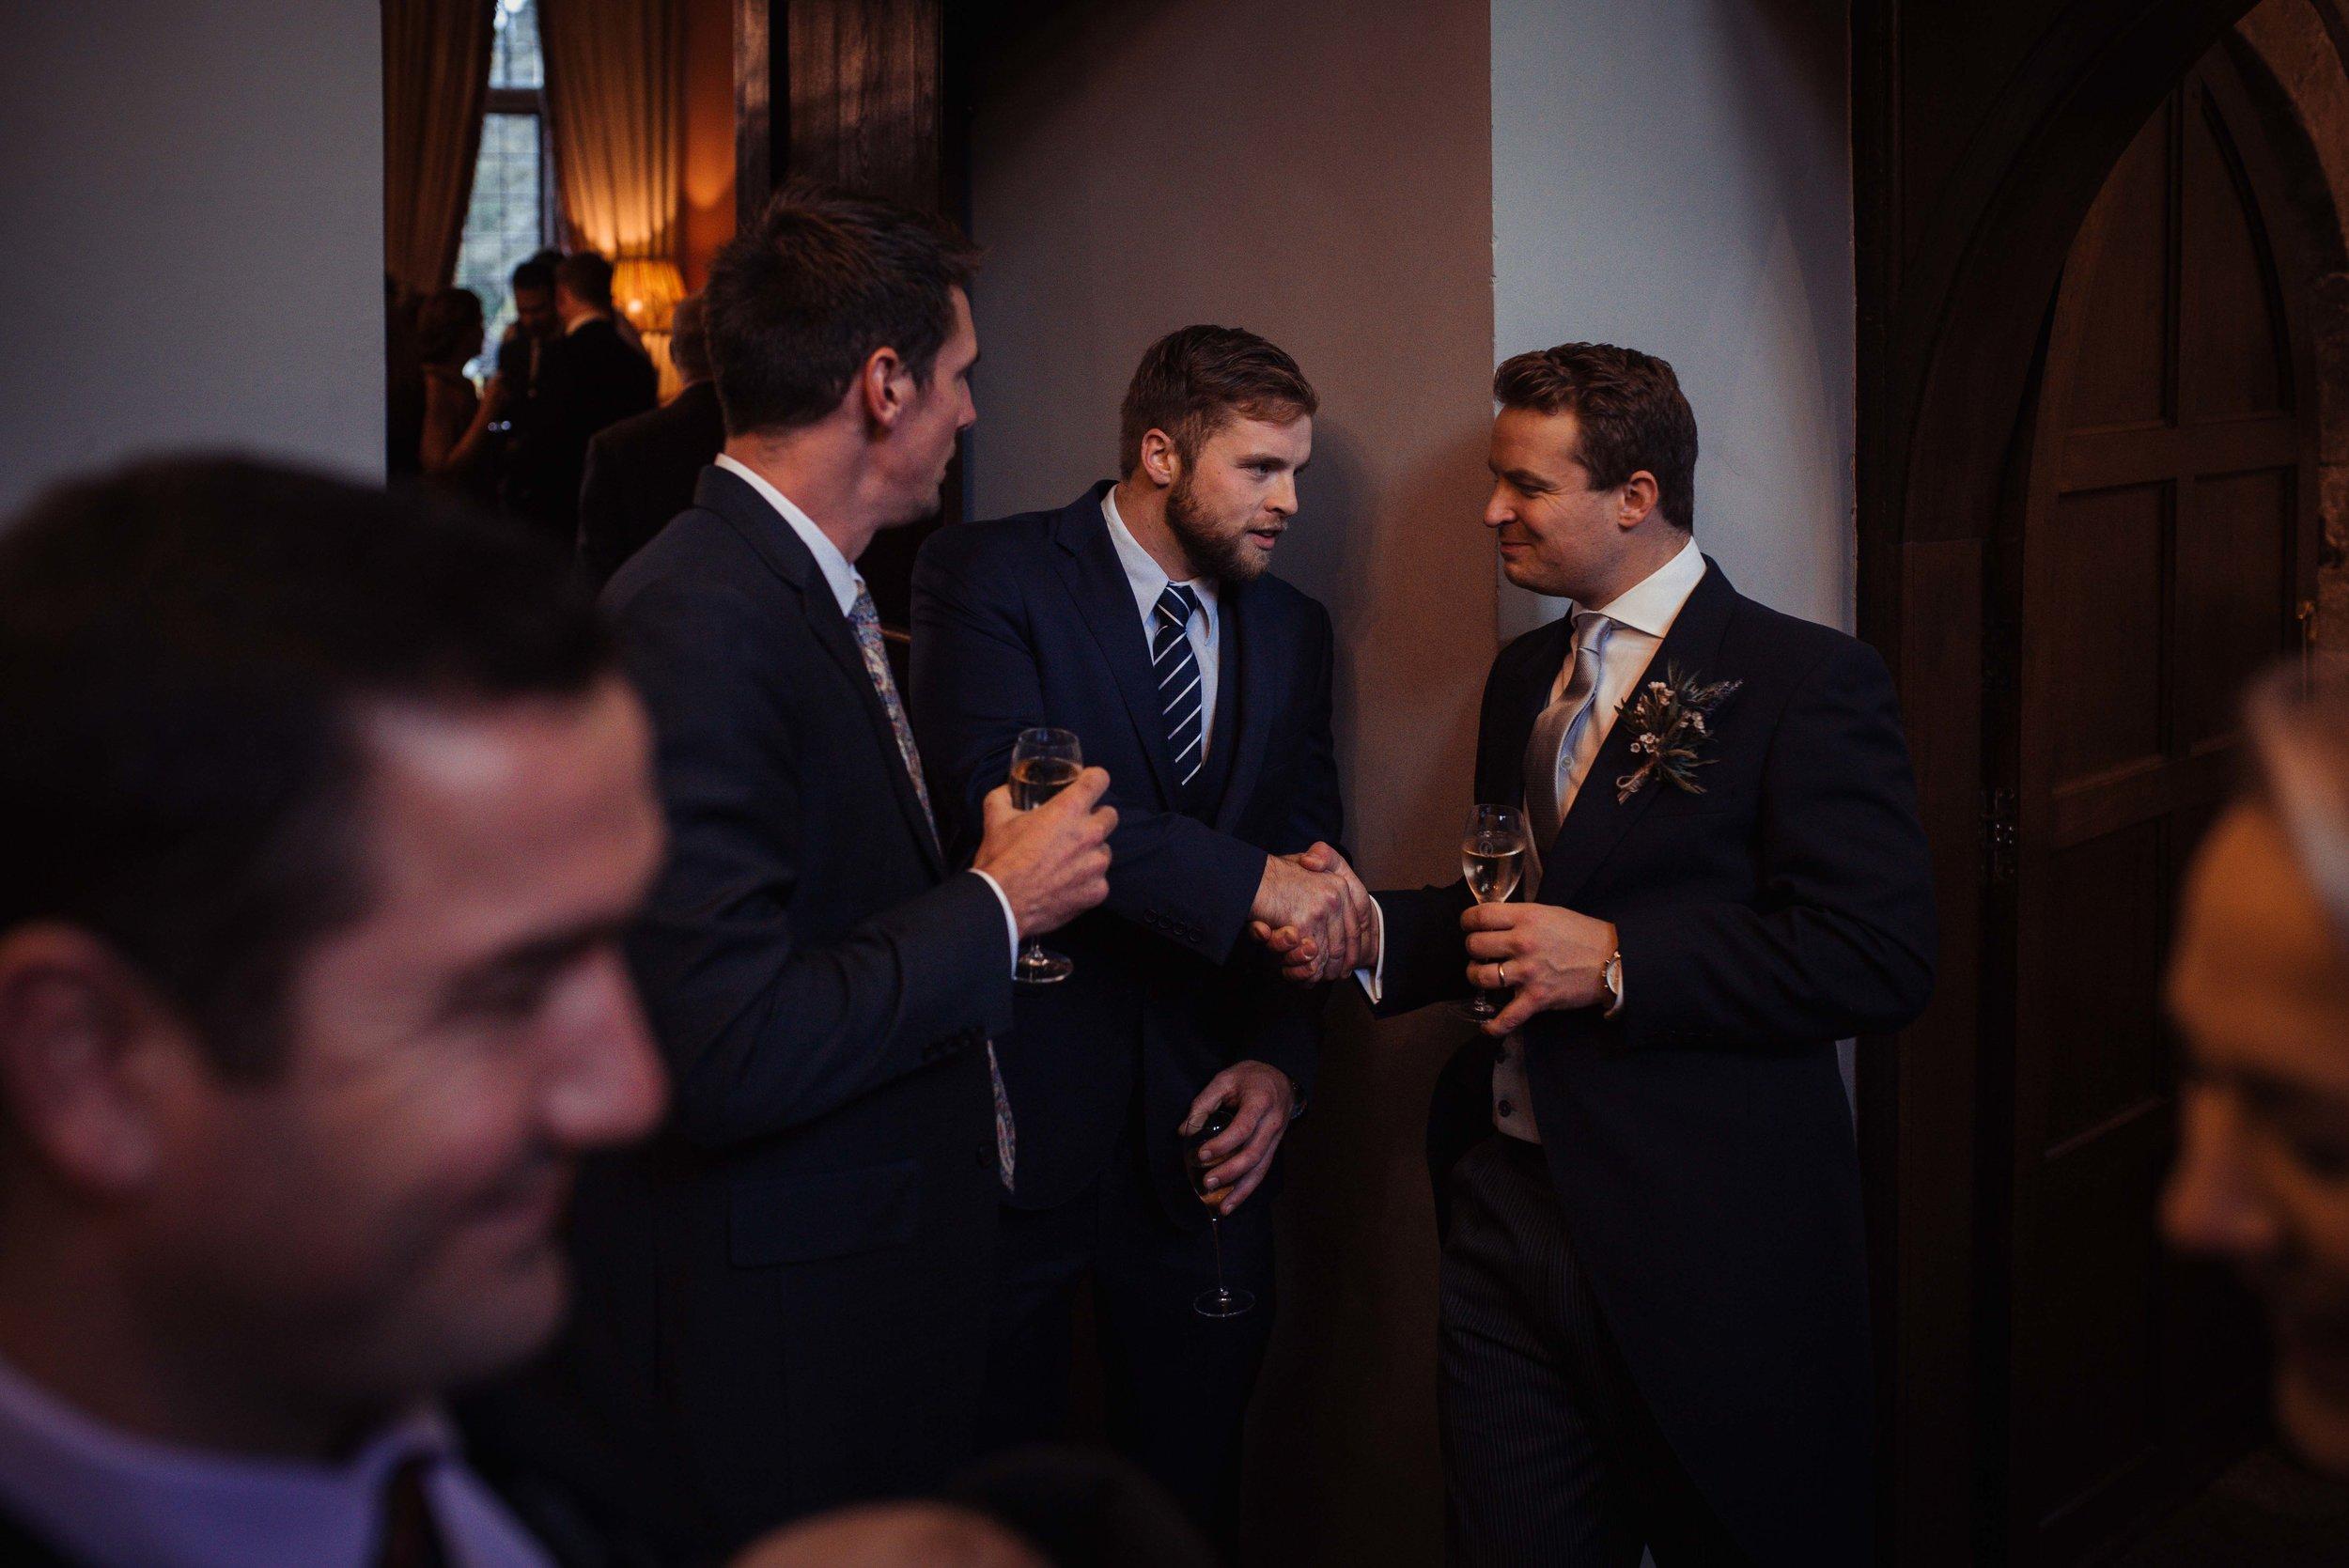 Askham-Hall-Wedding-Photography-49.jpg